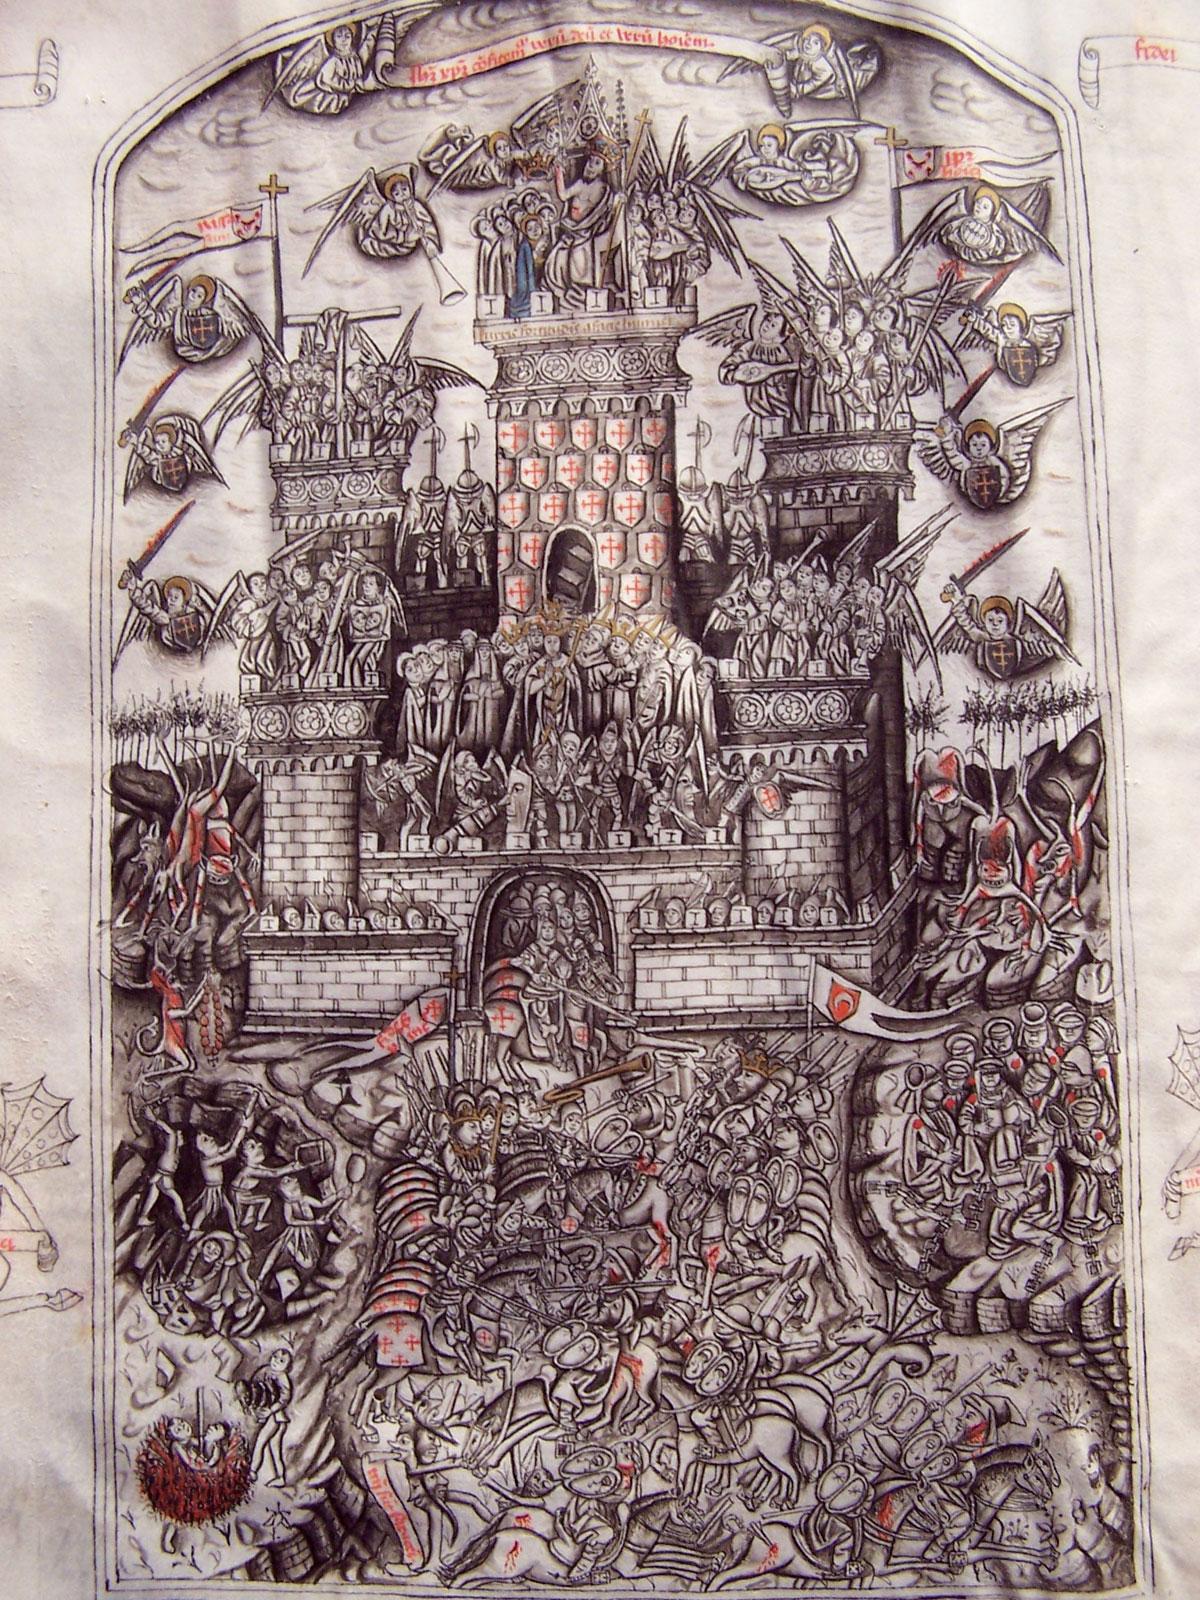 Alonso de Espina, Fortalitium fidei, 1464, Burgo de Osma, Biblioteca y archivo capitular, ms. 154